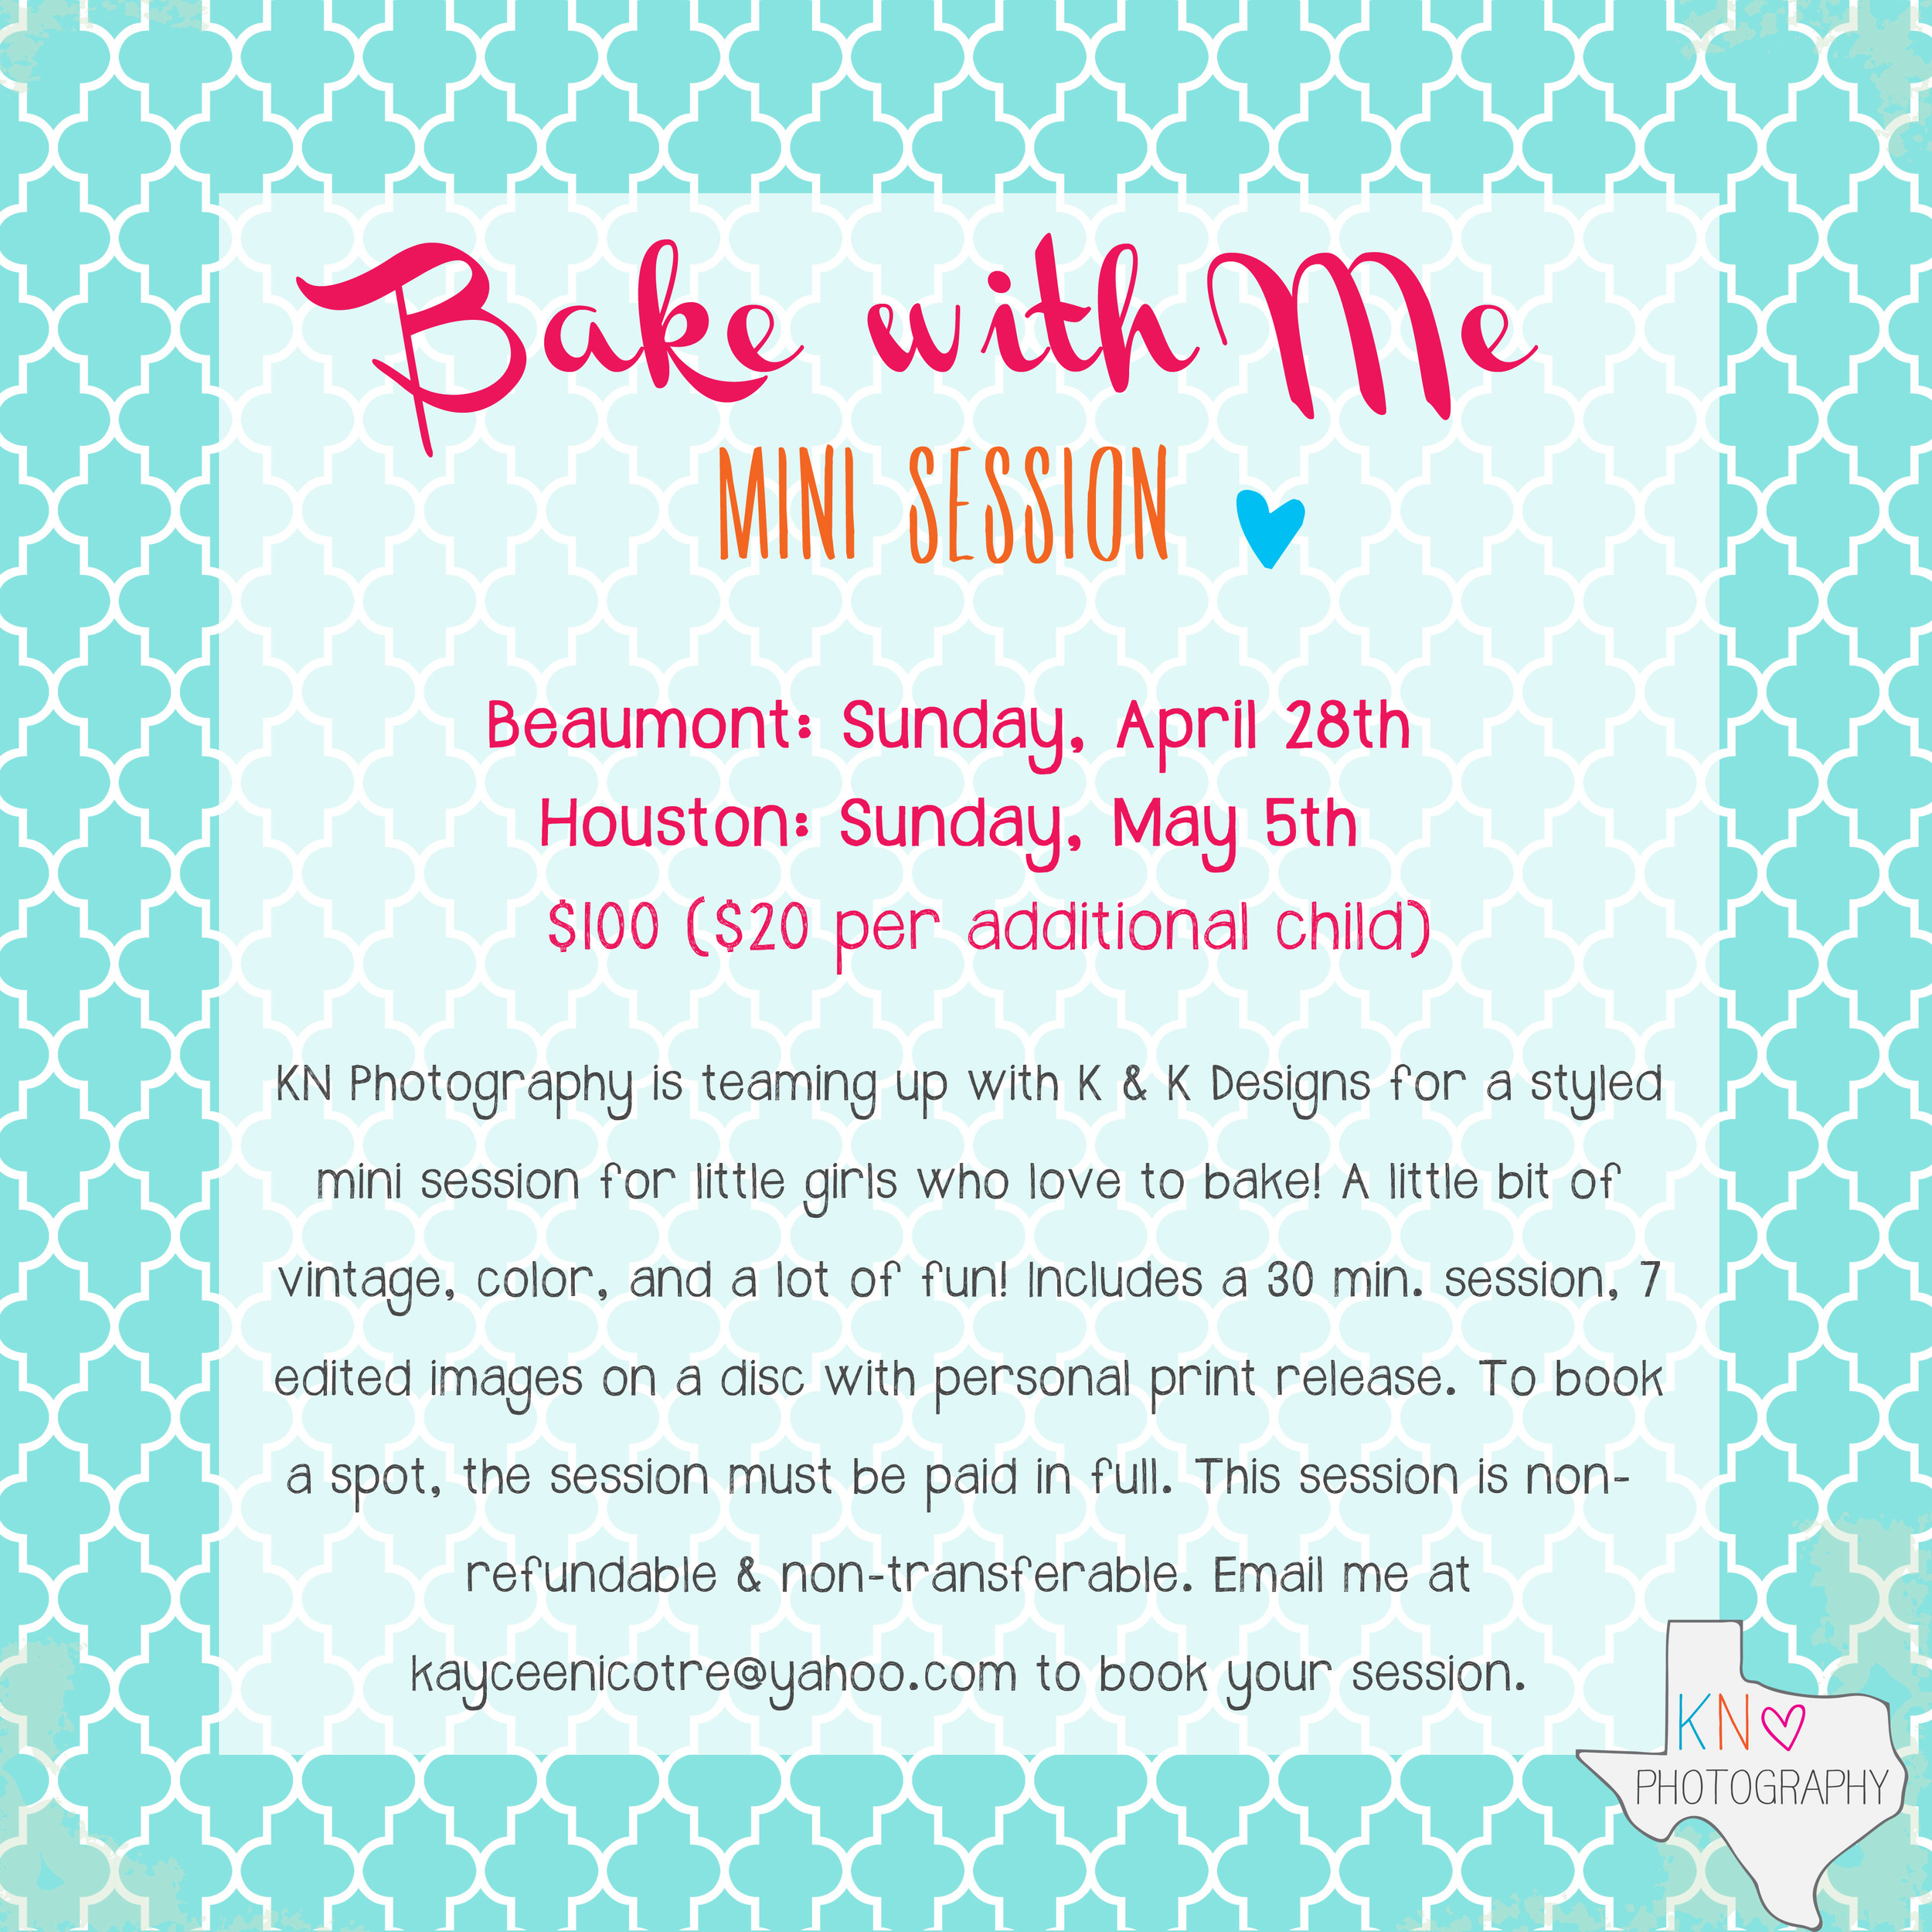 bake with me.jpg